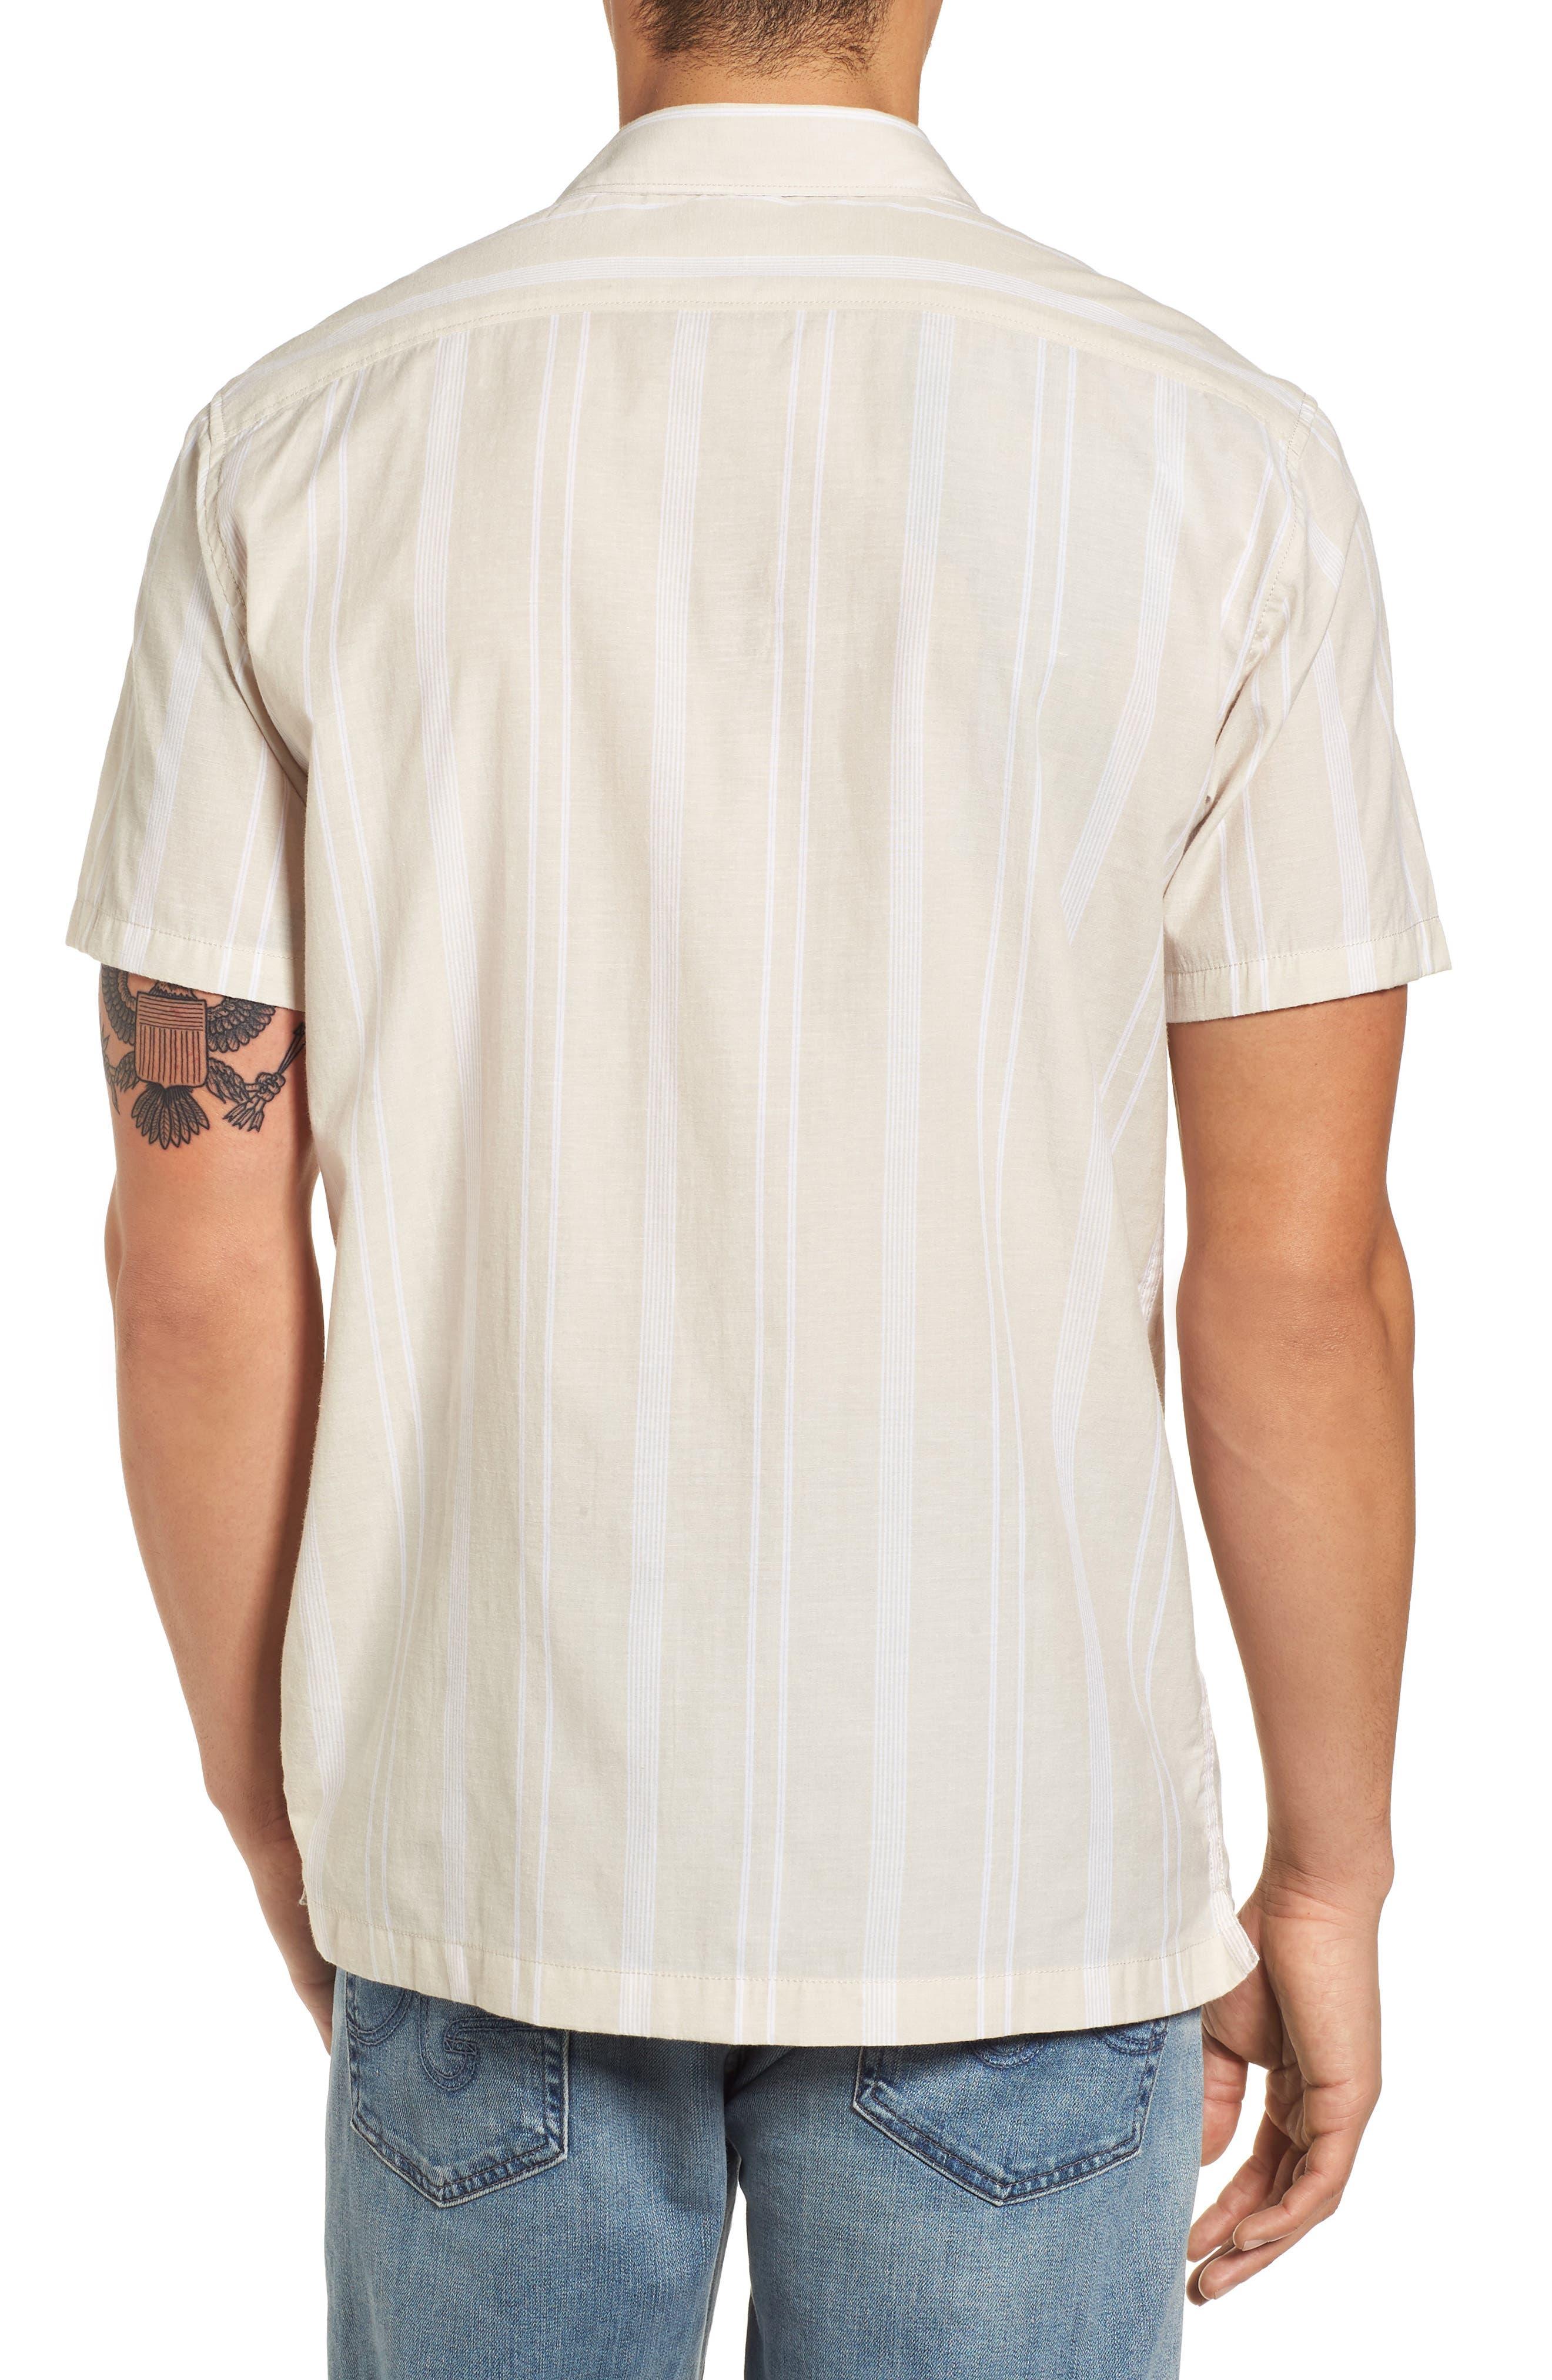 Donny Short Sleeve Shirt,                             Alternate thumbnail 3, color,                             Sand